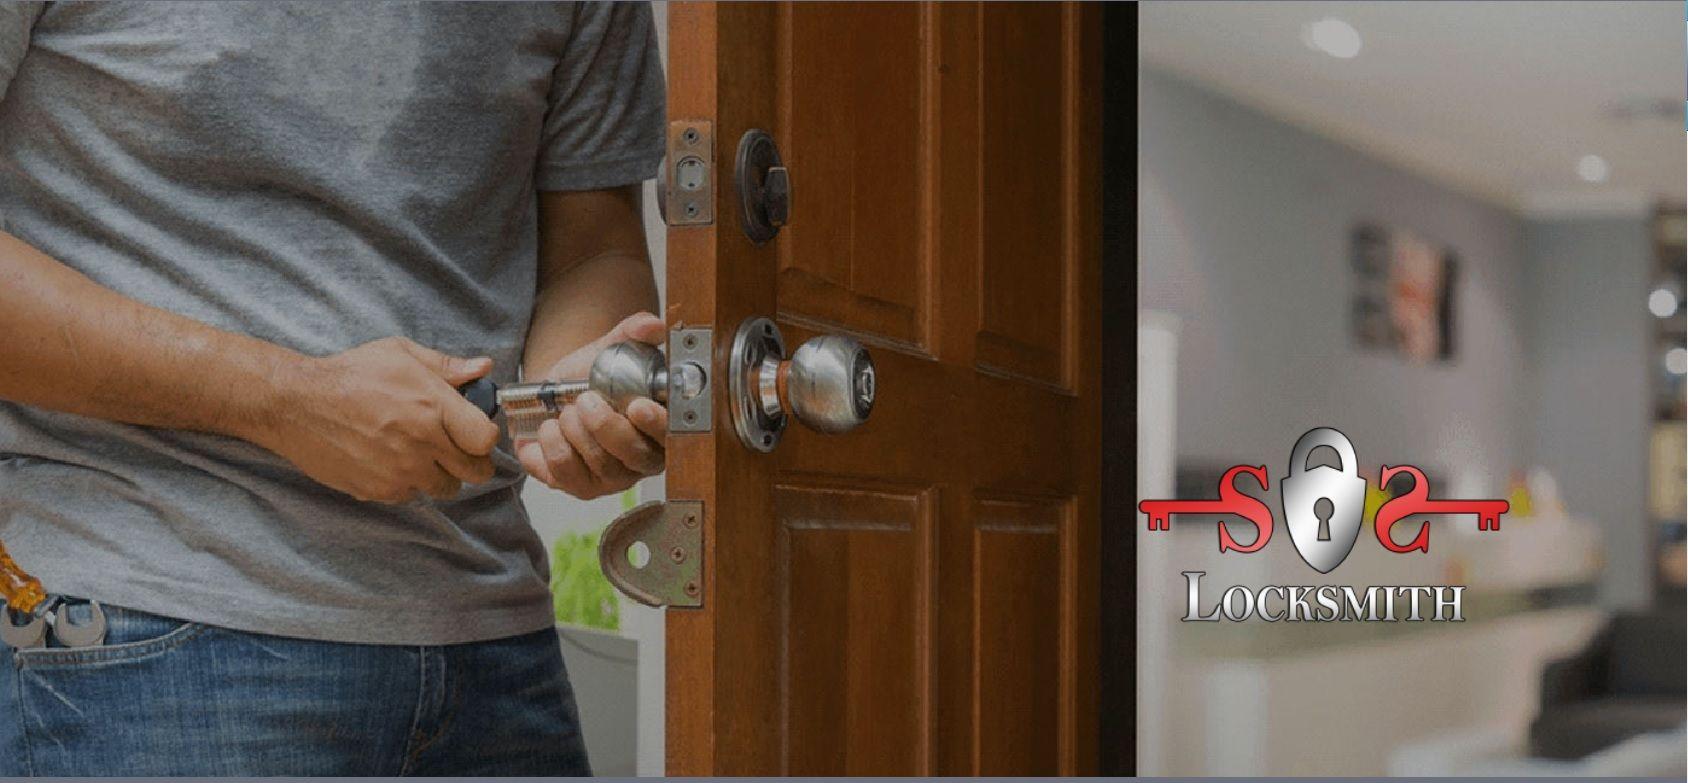 Best locksmiths dallas tx in 2020 locksmith locksmith